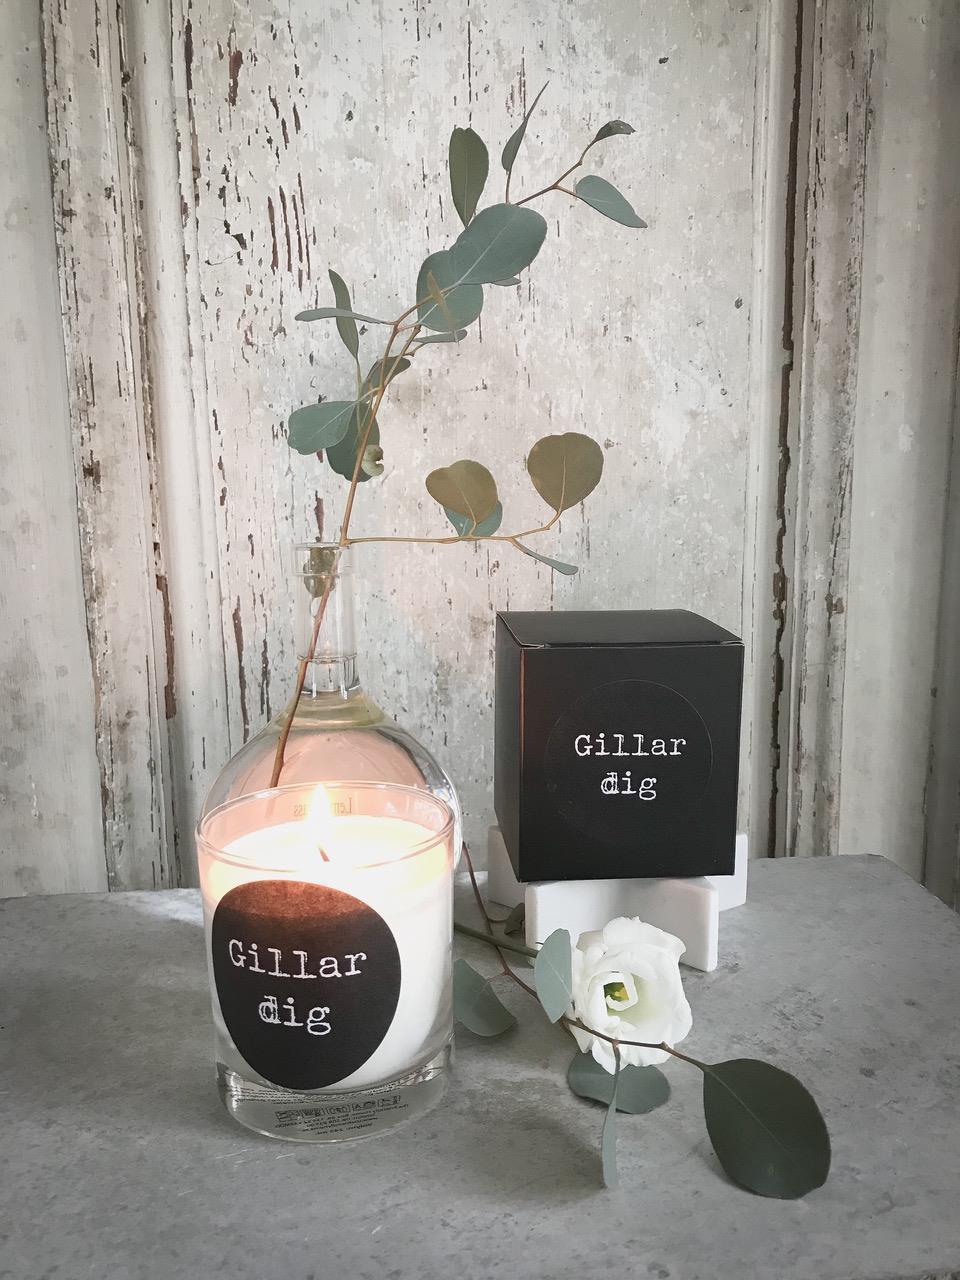 Doftljus, Gillar dig, svart/vit text